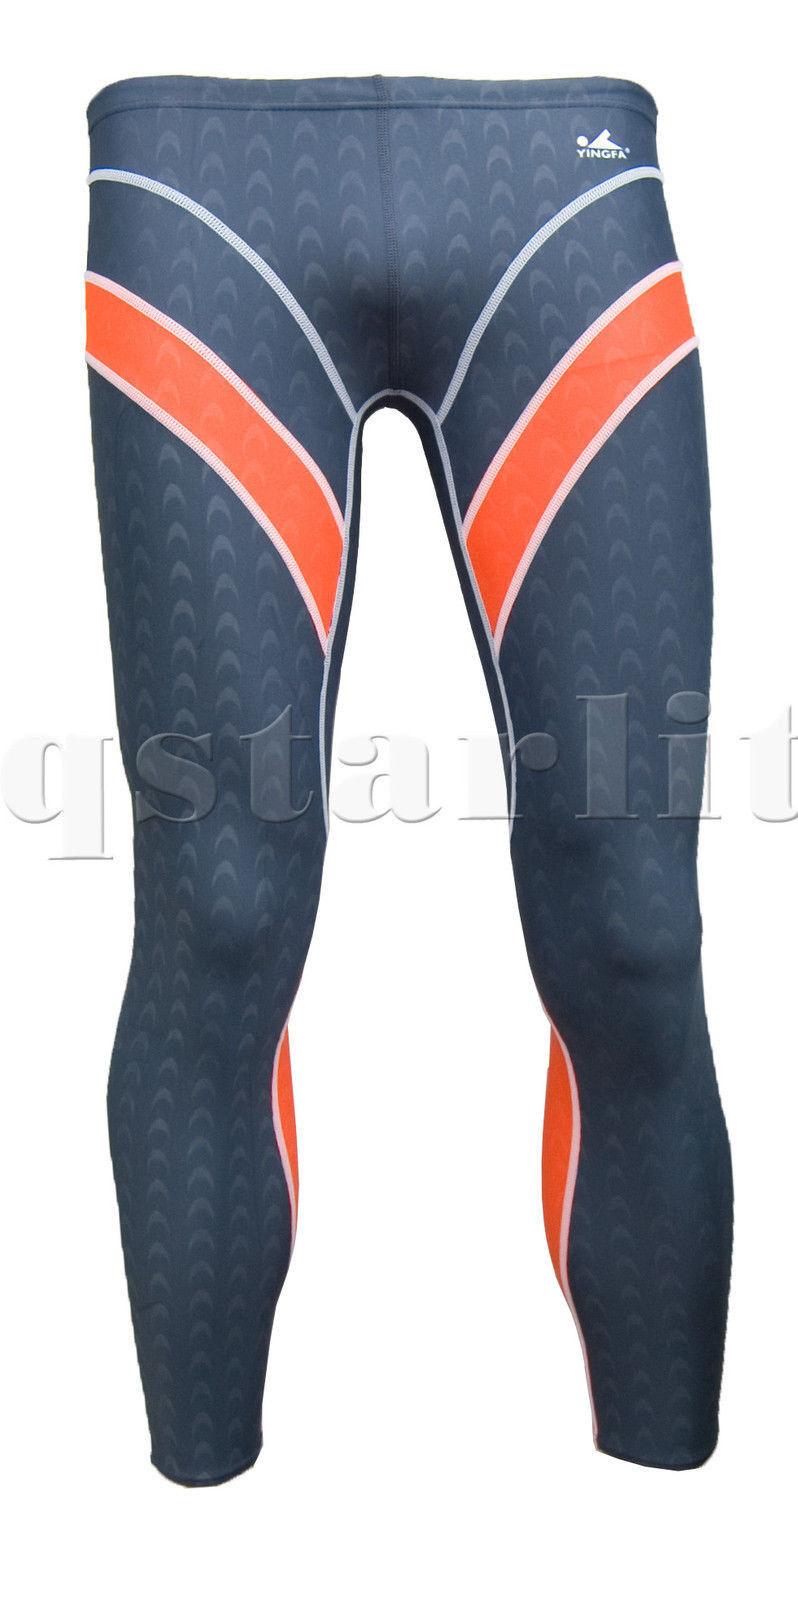 Men Male Racing Training Fast Skin Openwater Legskin Pants Swimwear Size 30  XL